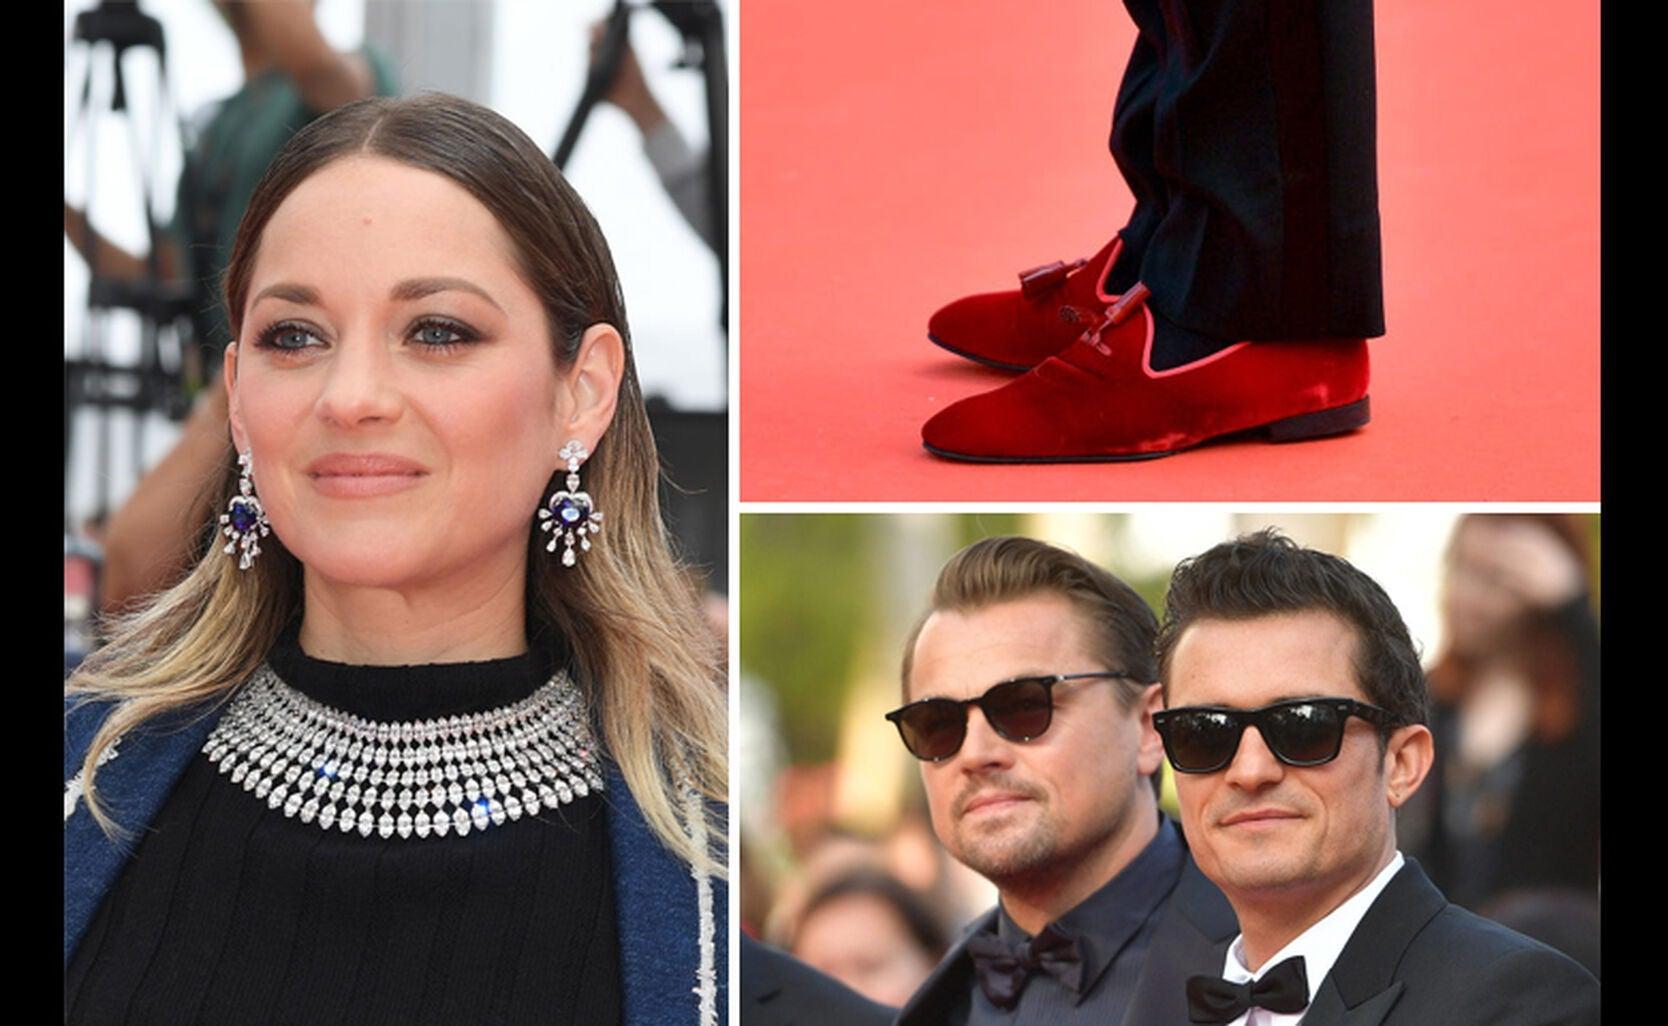 Marion Cotillard, Nusret Gokce aka Salt Bae, Leonardo DiCaprio with Orlando Bloom